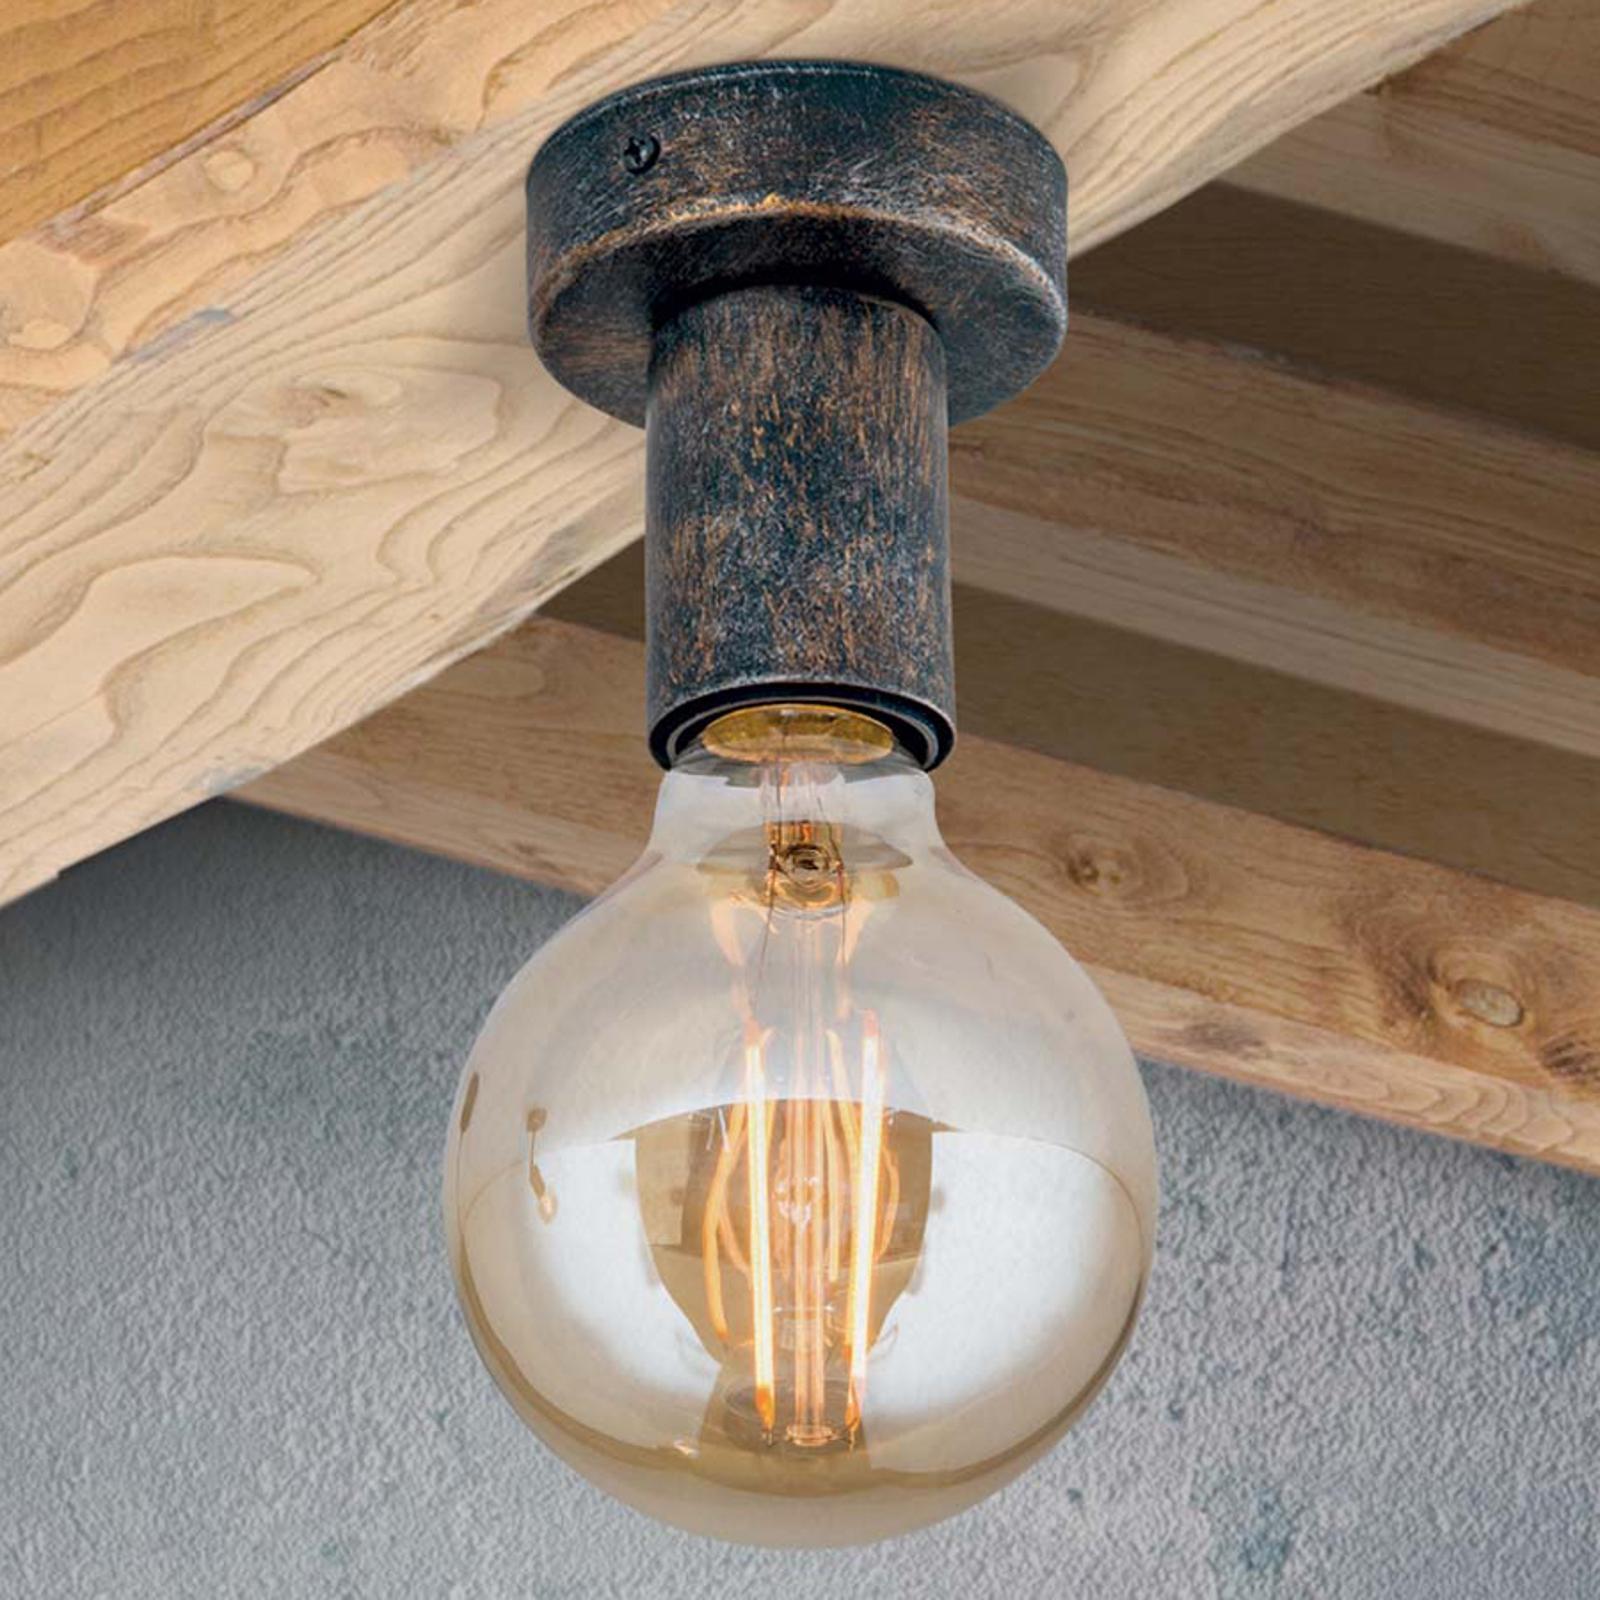 Prosta lampa sufitowa Rati w tyslu vintage